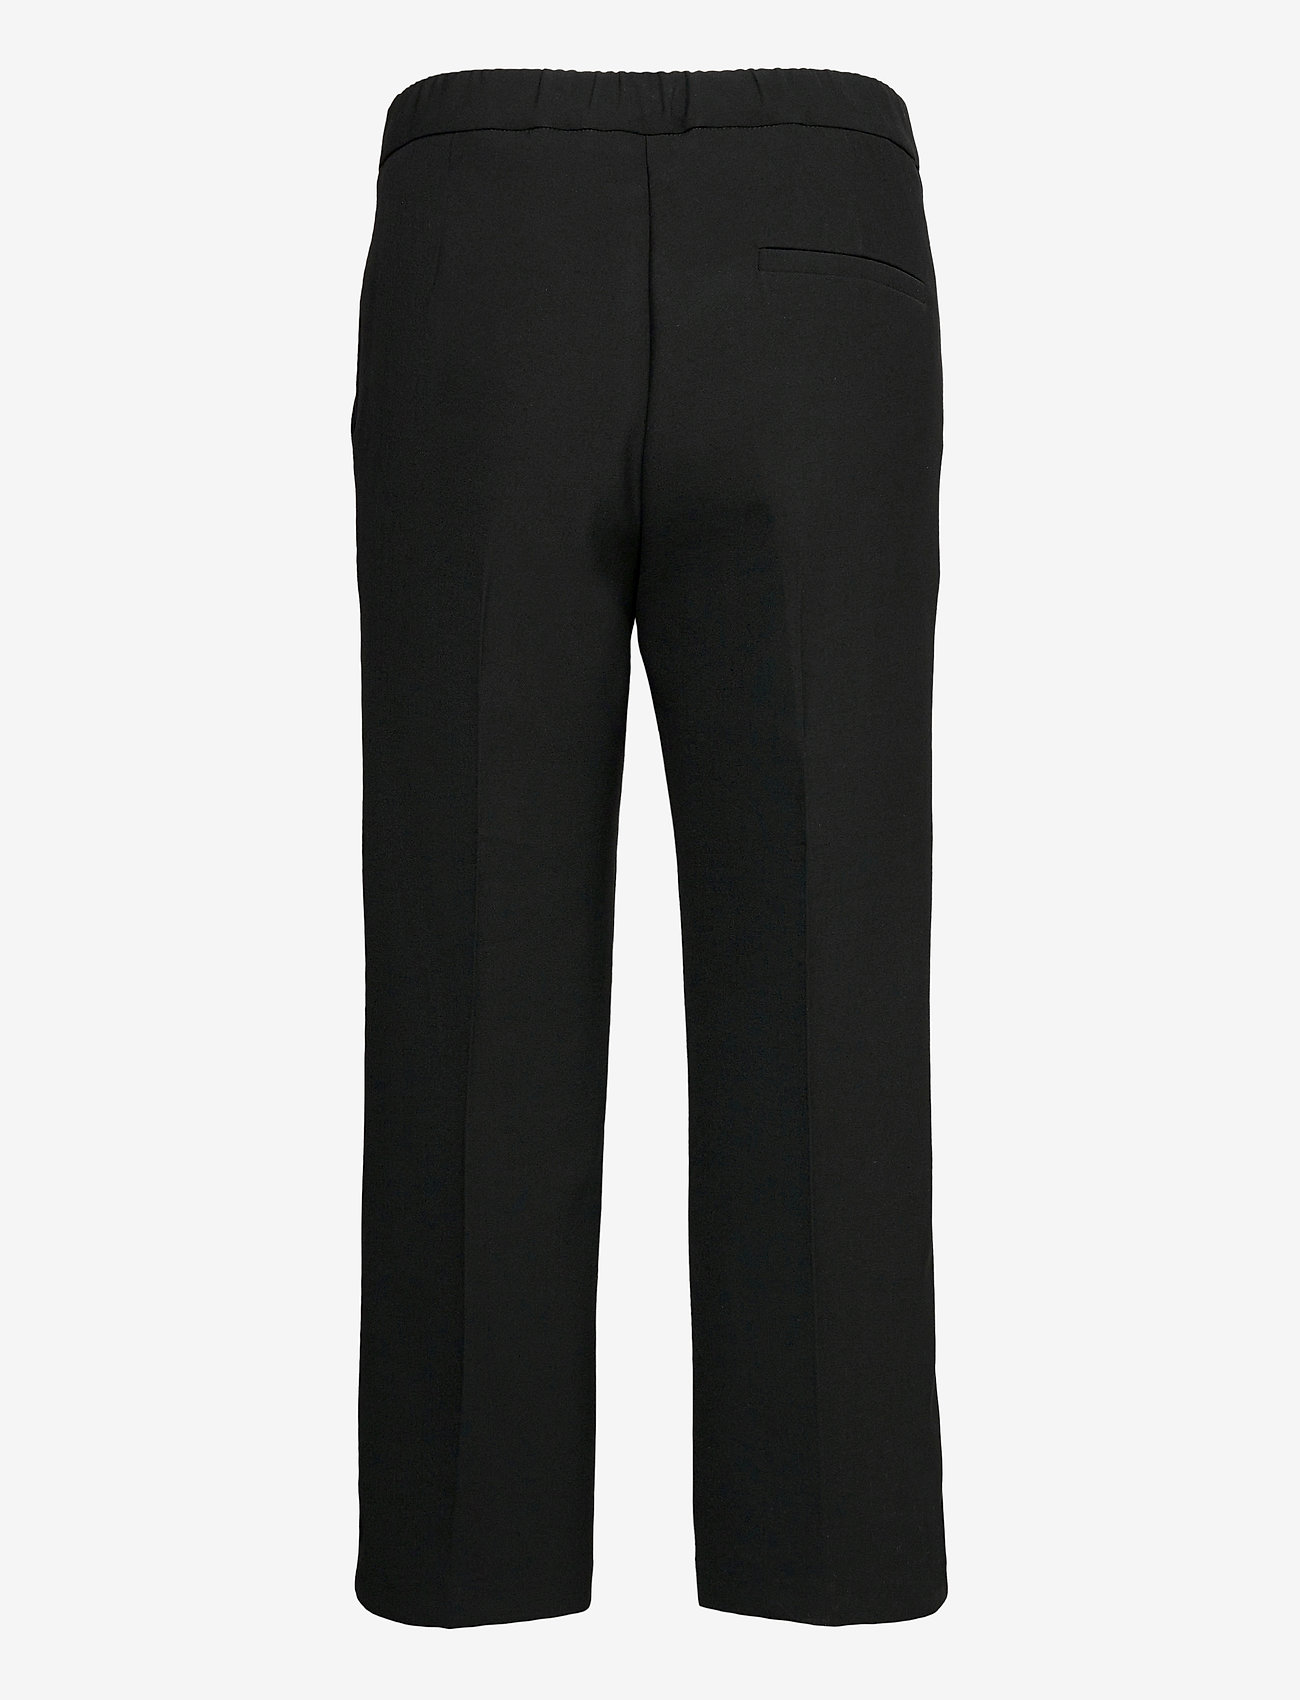 Marimekko - HAKKU SOLID TROUSERS - bukser med lige ben - black - 1